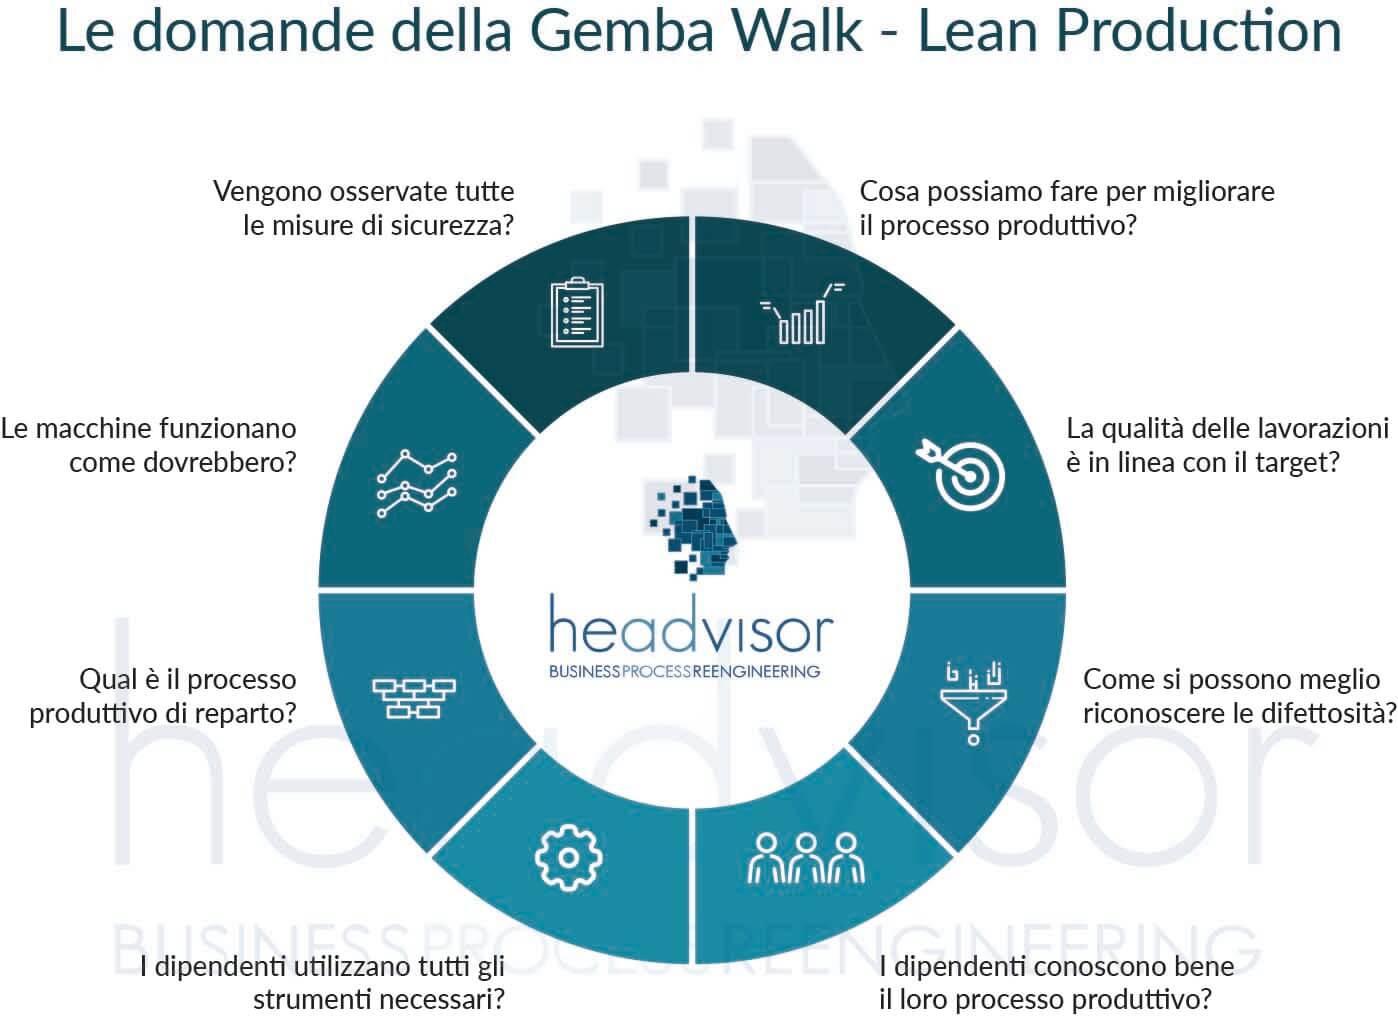 Lean Production: Gemba Walk | headvisor